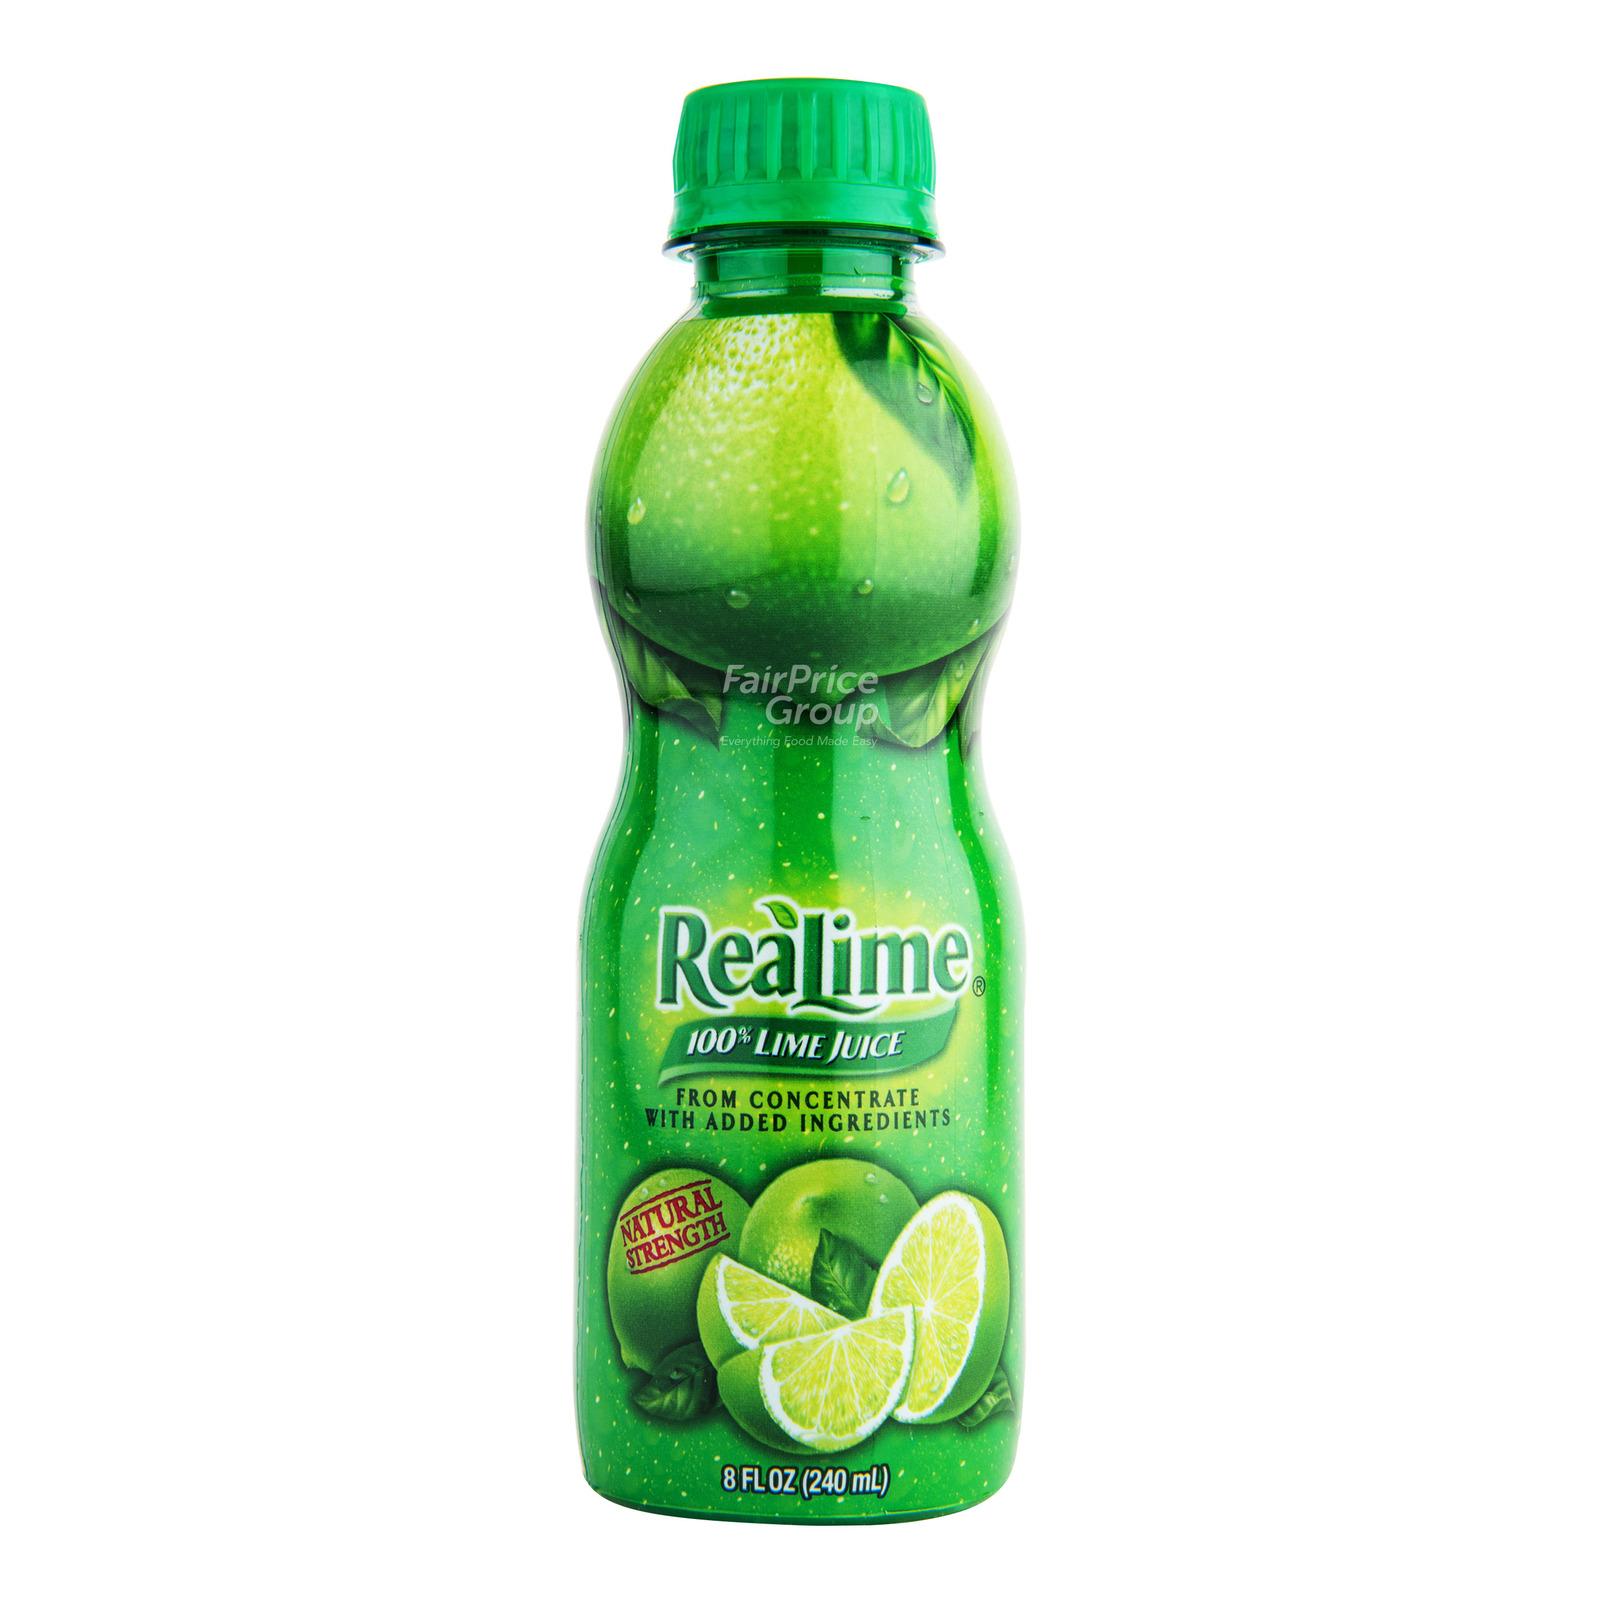 ReaLime 100% Lime Bottle Juice